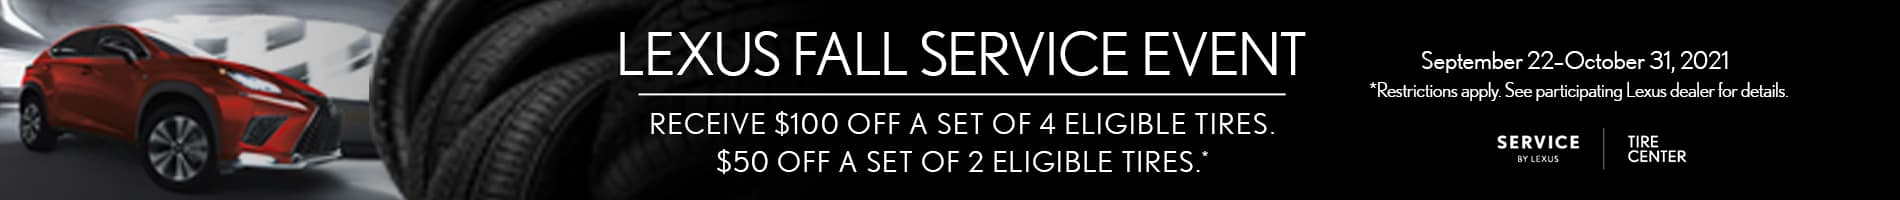 2021-09-22 Service Page Top_Desk